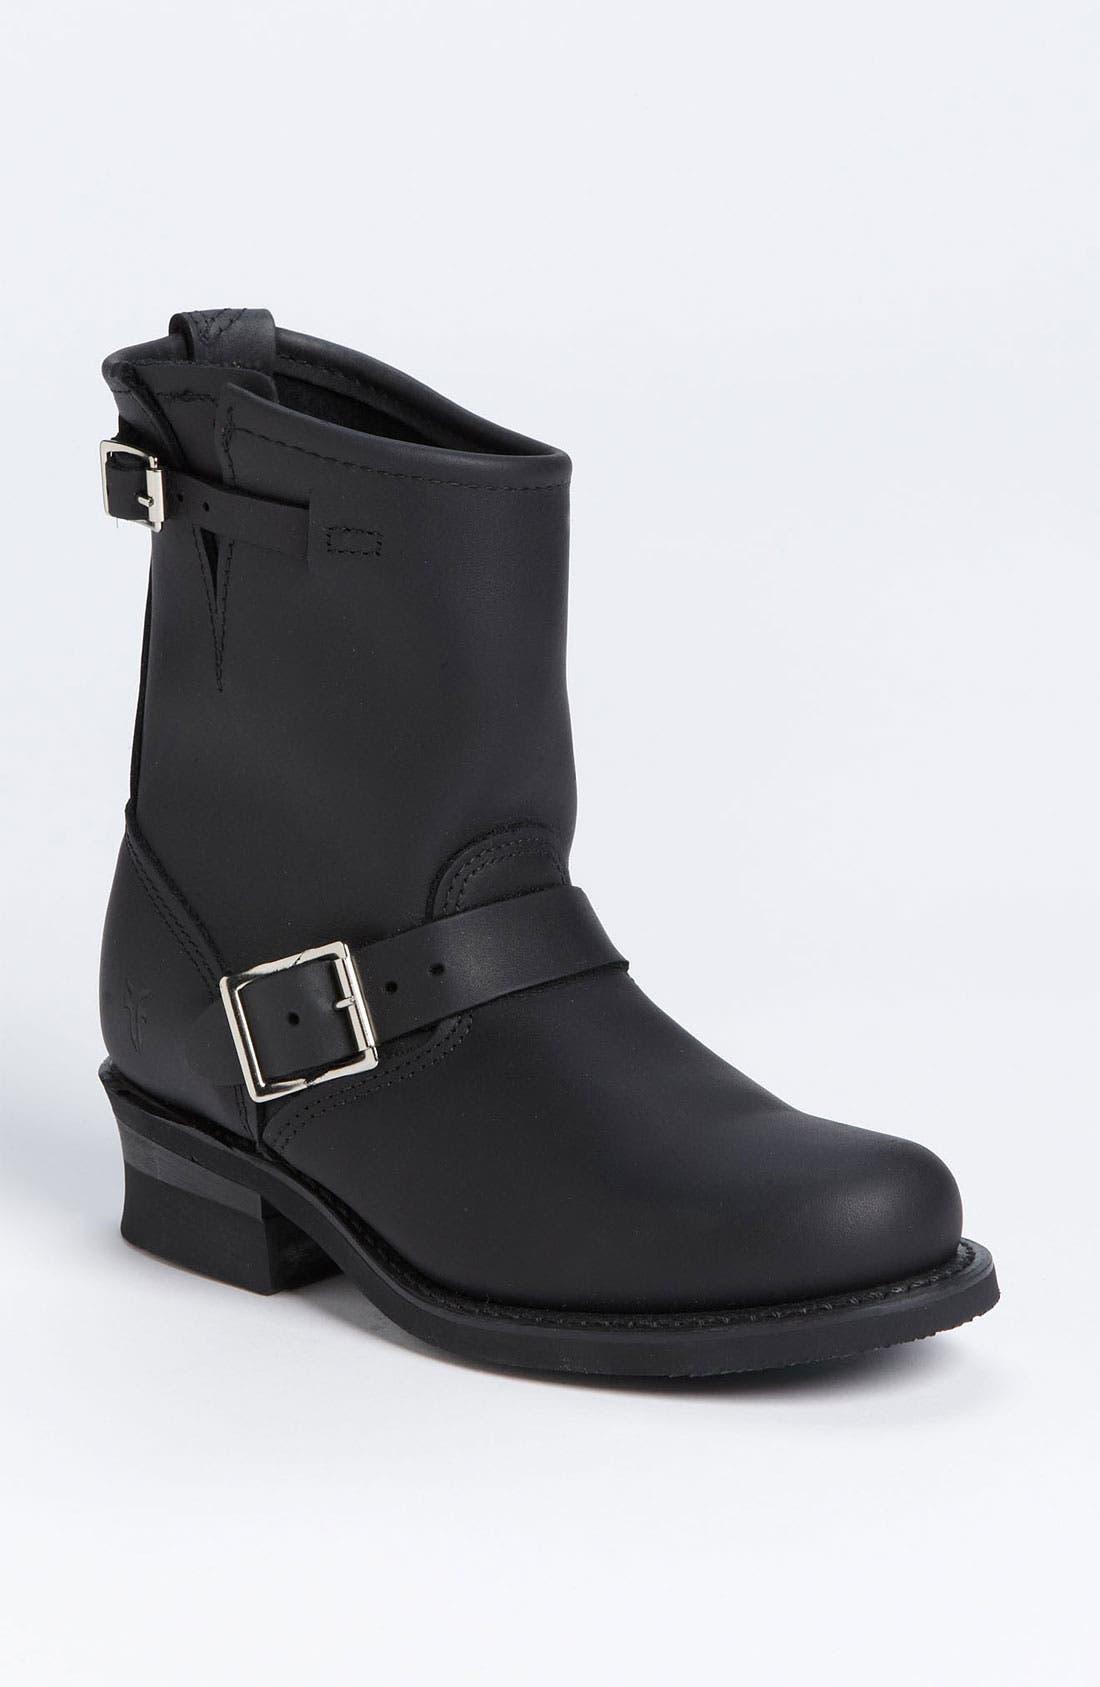 Alternate Image 1 Selected - Frye 'Engineer 8R' Leather Boot (Women)